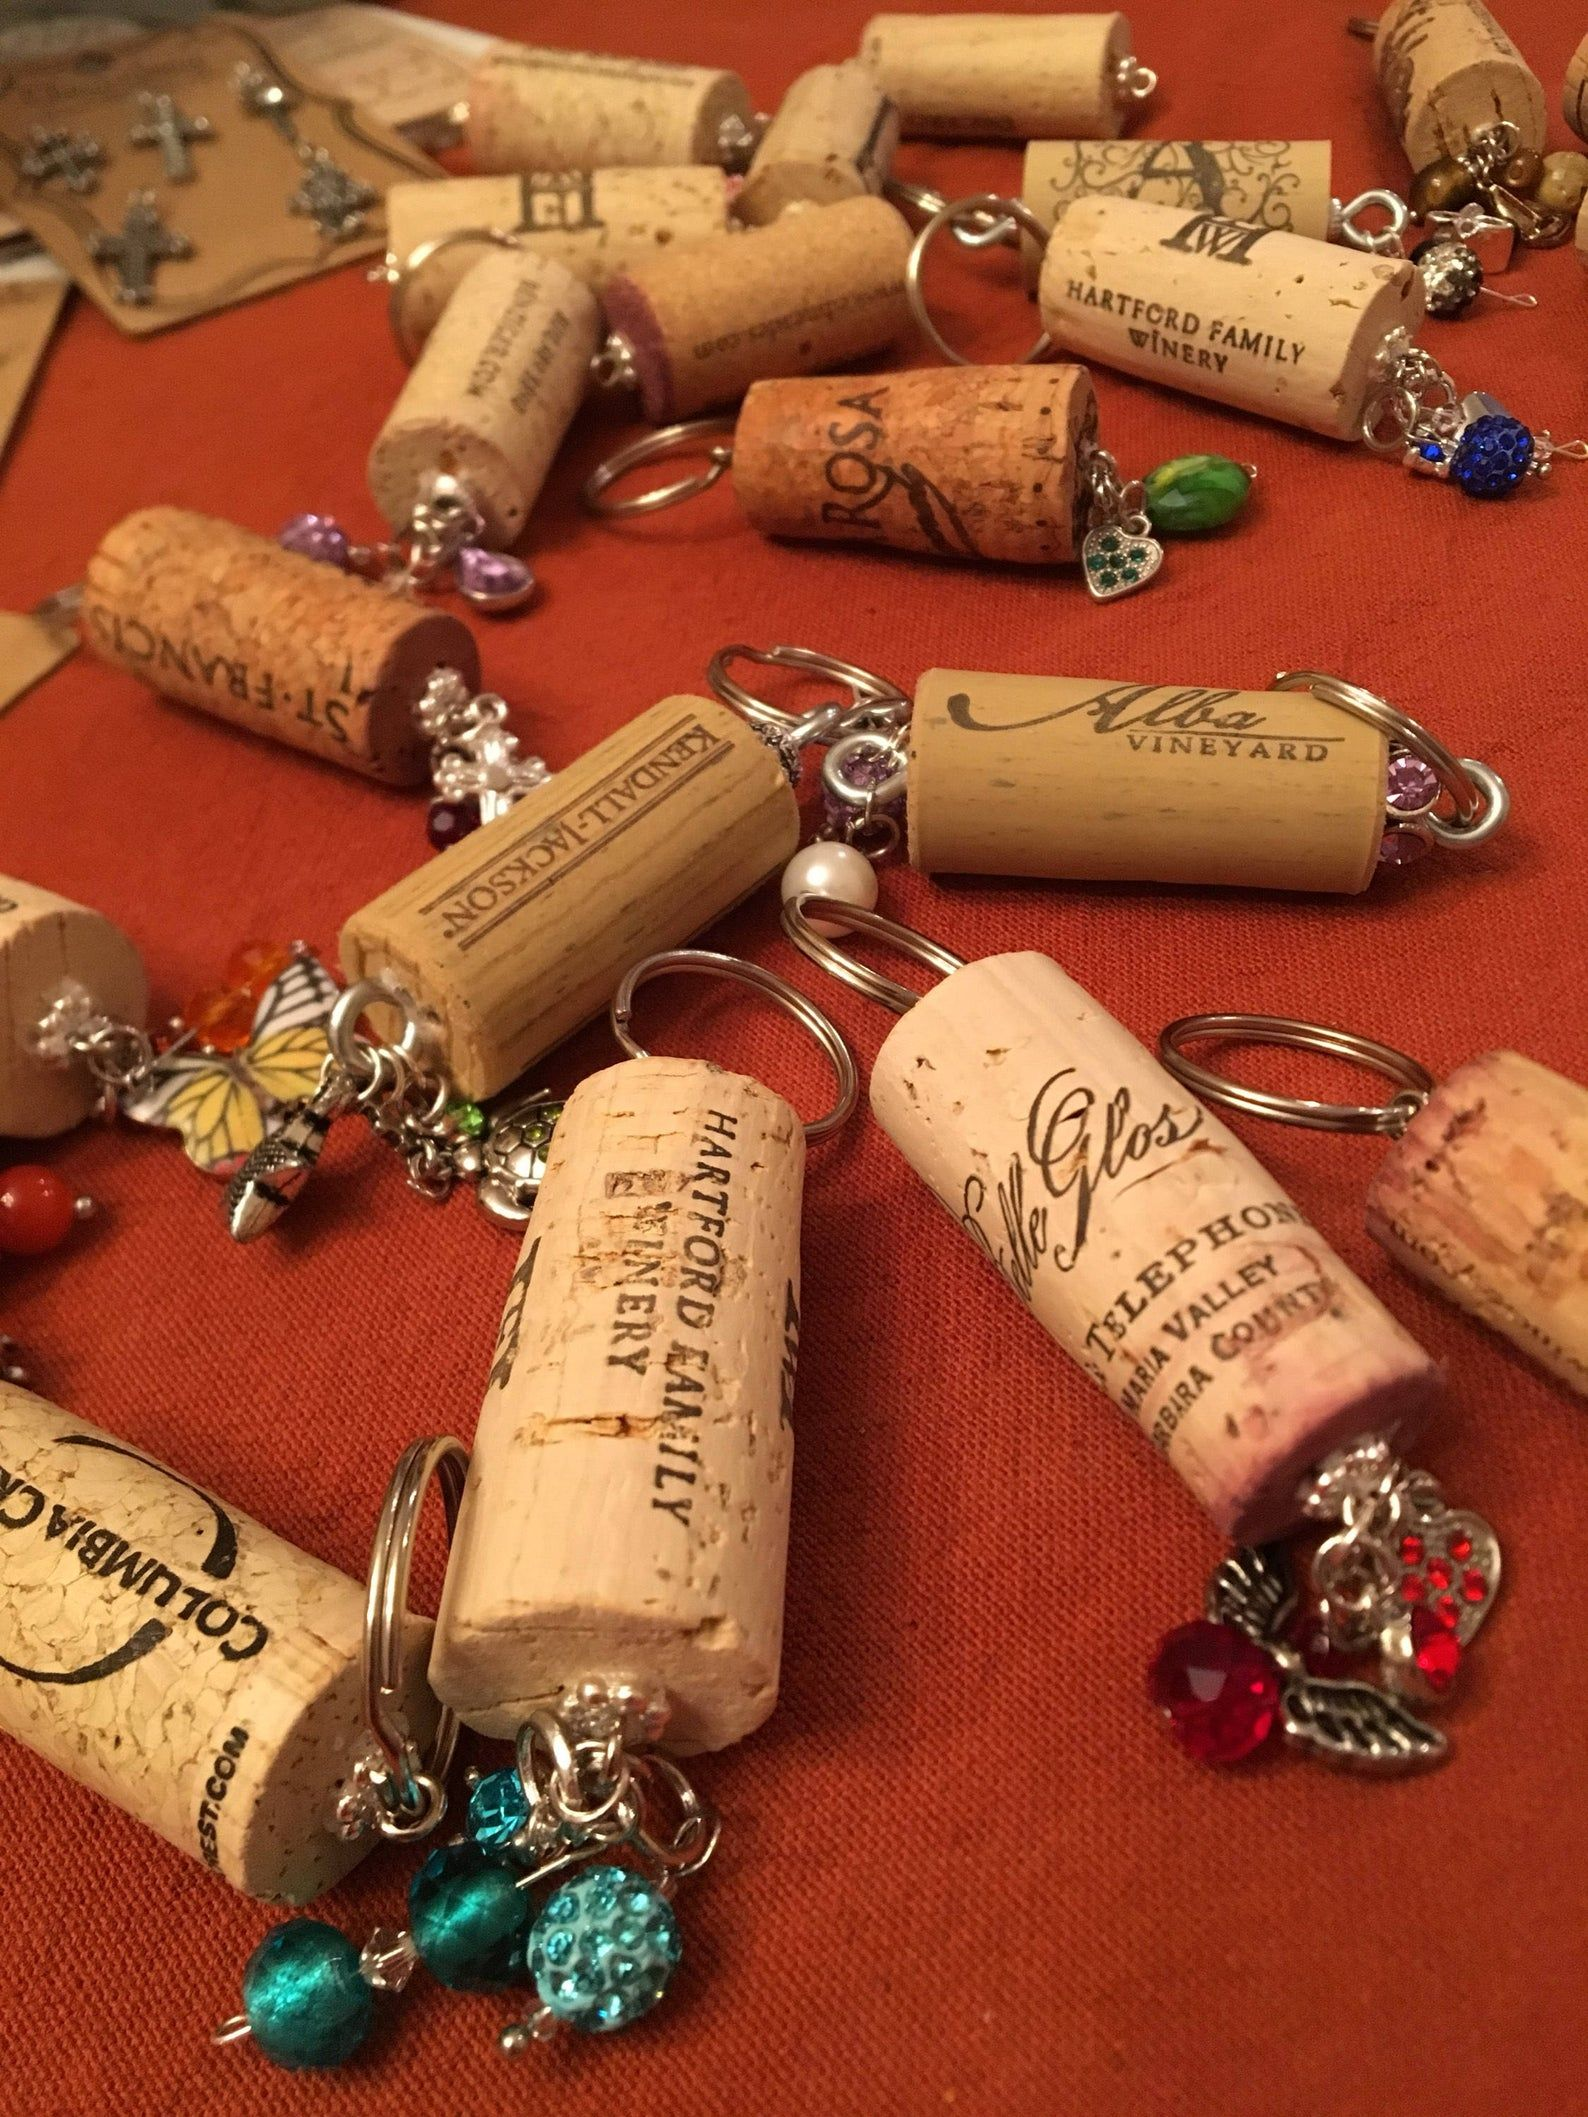 Wine Cork Keychains Wine Cork Decor Wine Gifts New Home Etsy In 2020 Wine Corks Decor Wine Cork Wine Cork Ornaments